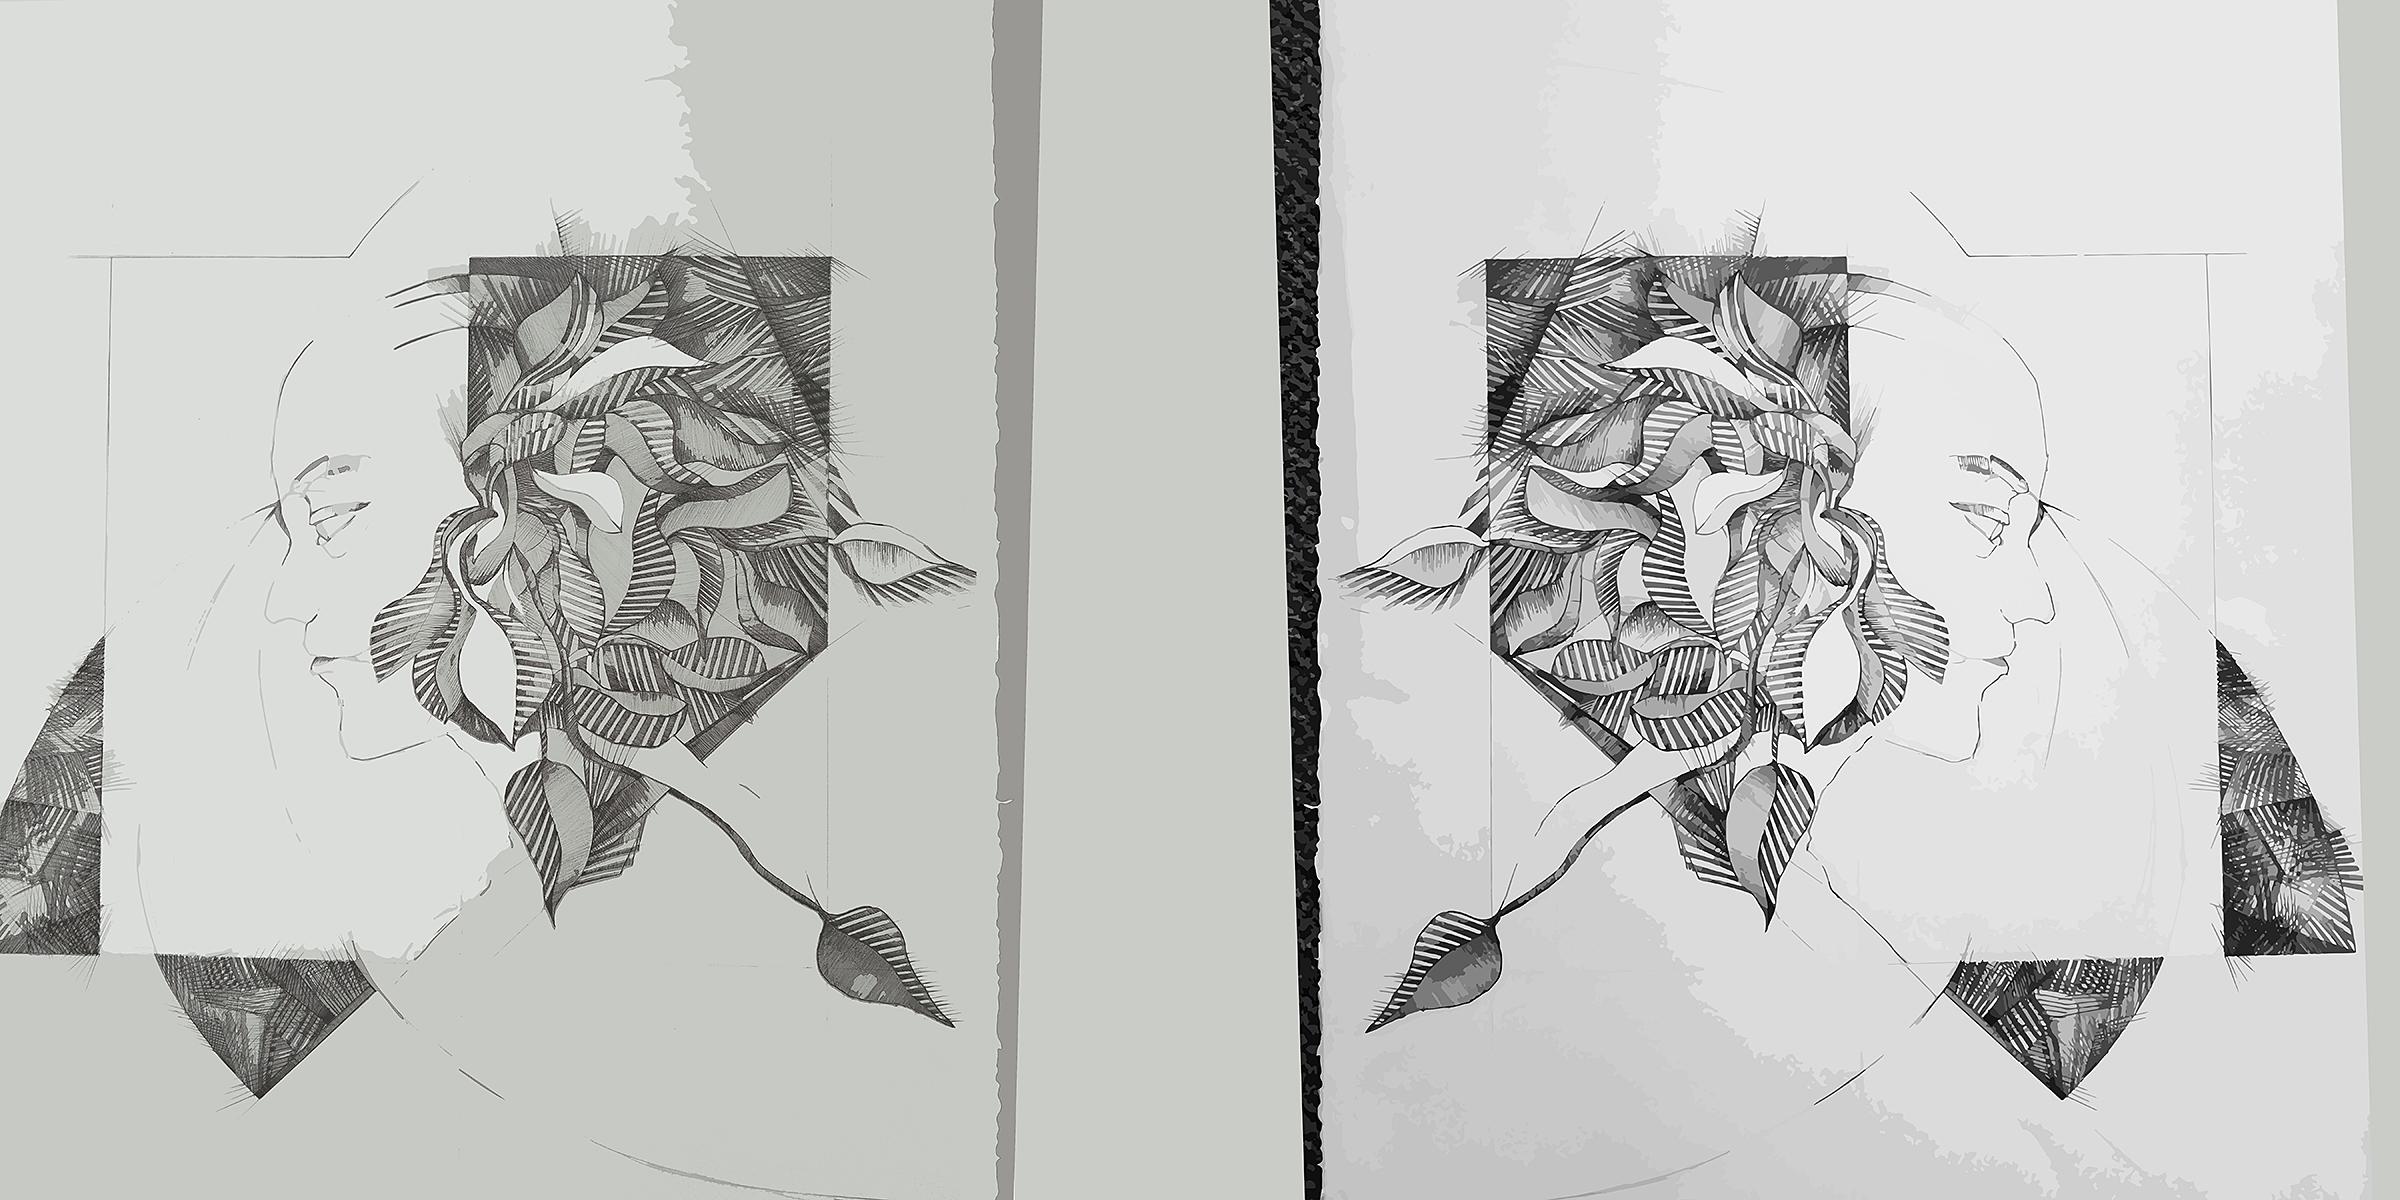 Head Rush Split   Mixed Media Digital Print 18x36 Inches, 2018